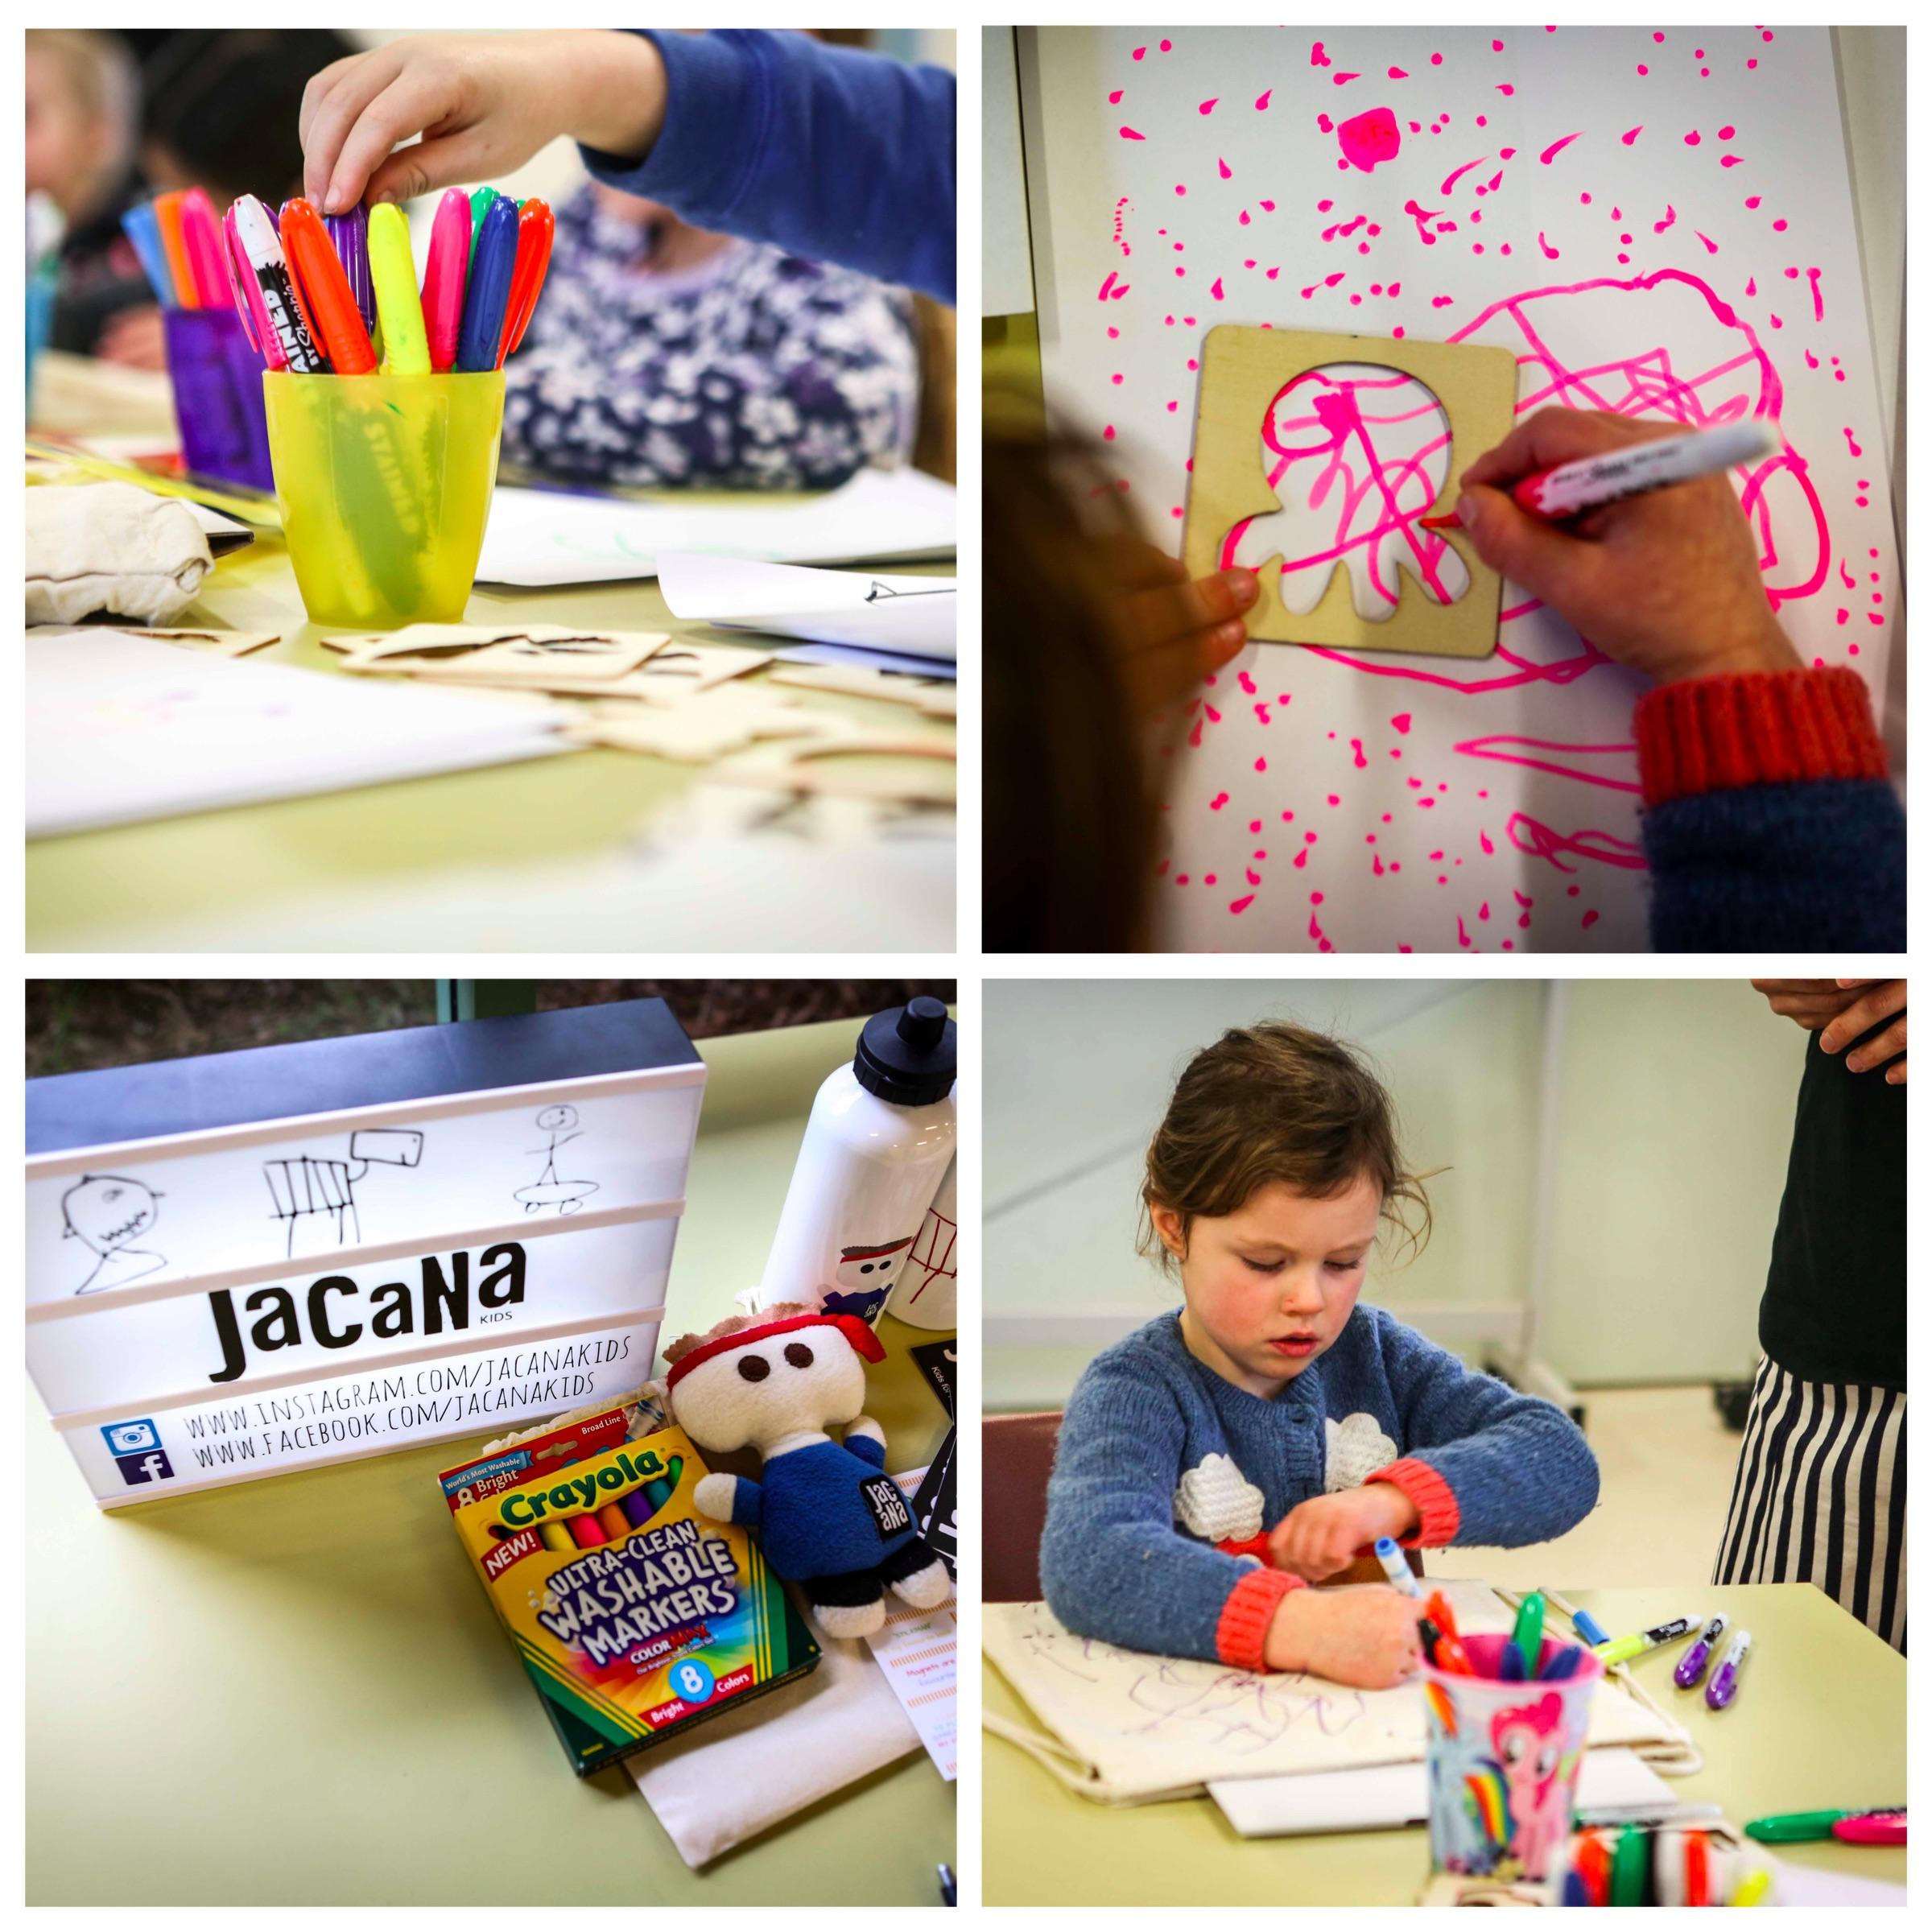 J01 acana Kids Workshop - Mamma Knows East (1 of 8).jpg